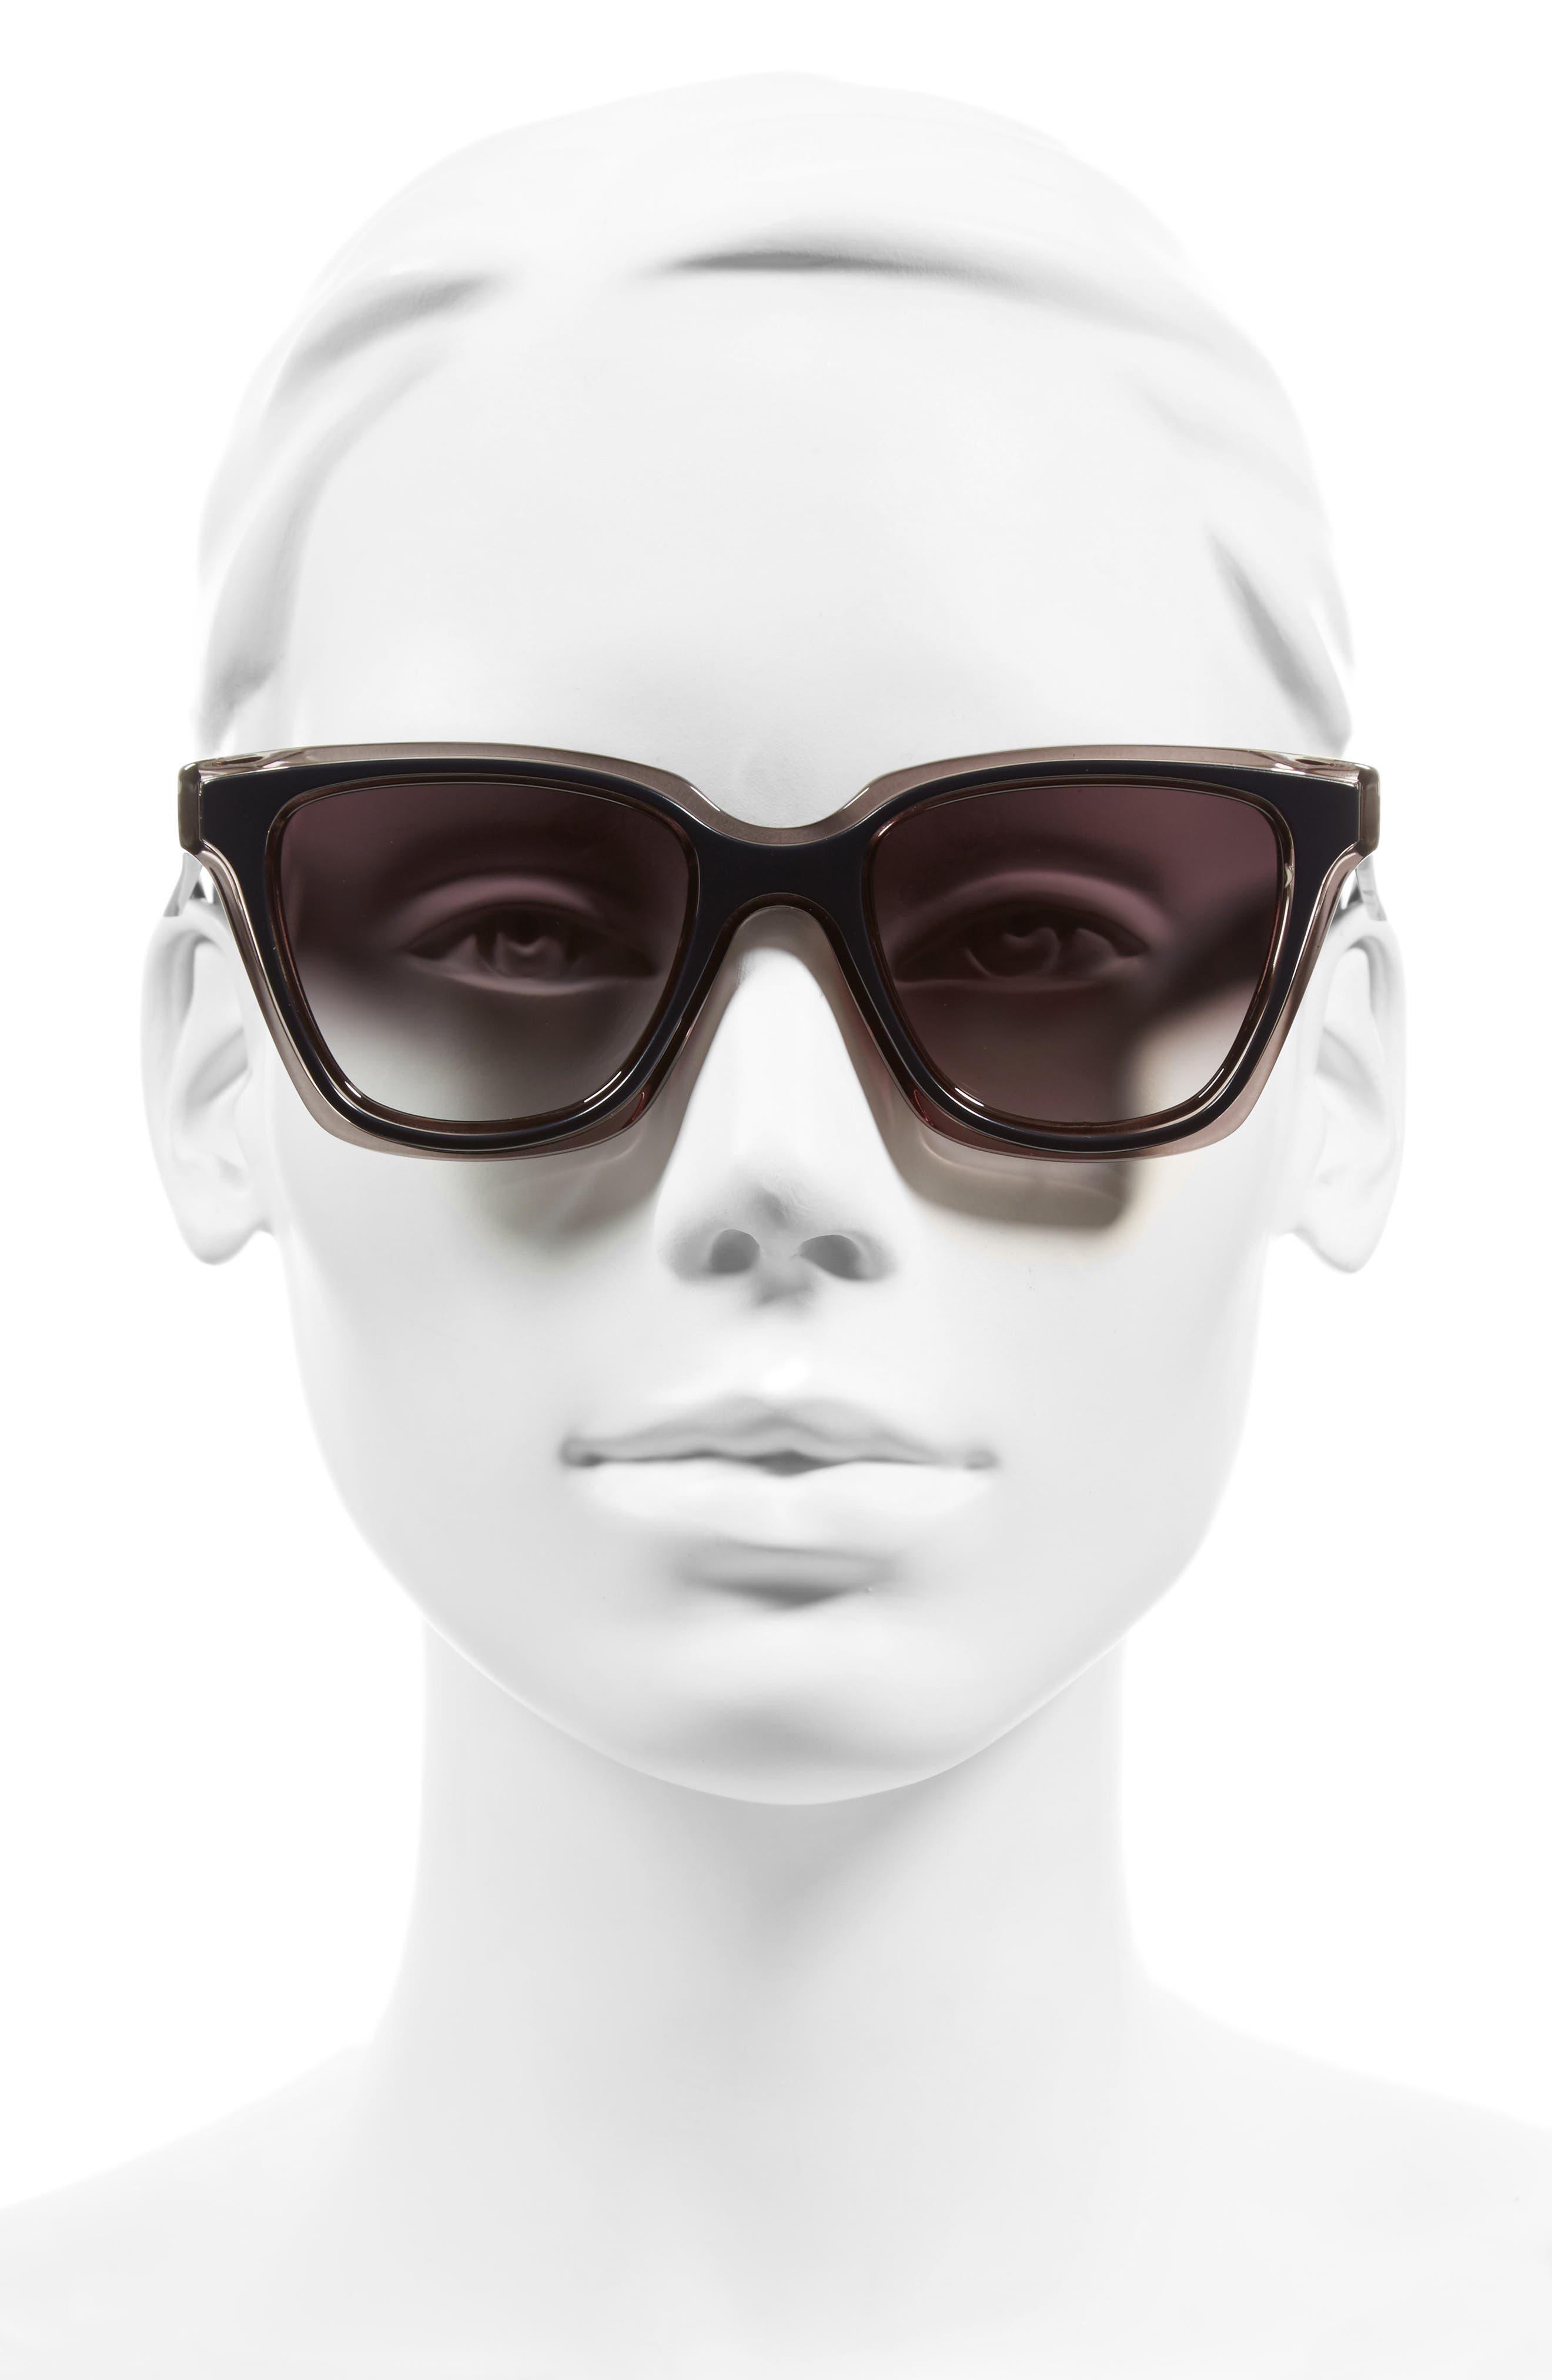 Be You 50mm Gradient Sunglasses,                             Alternate thumbnail 3, color,                             020